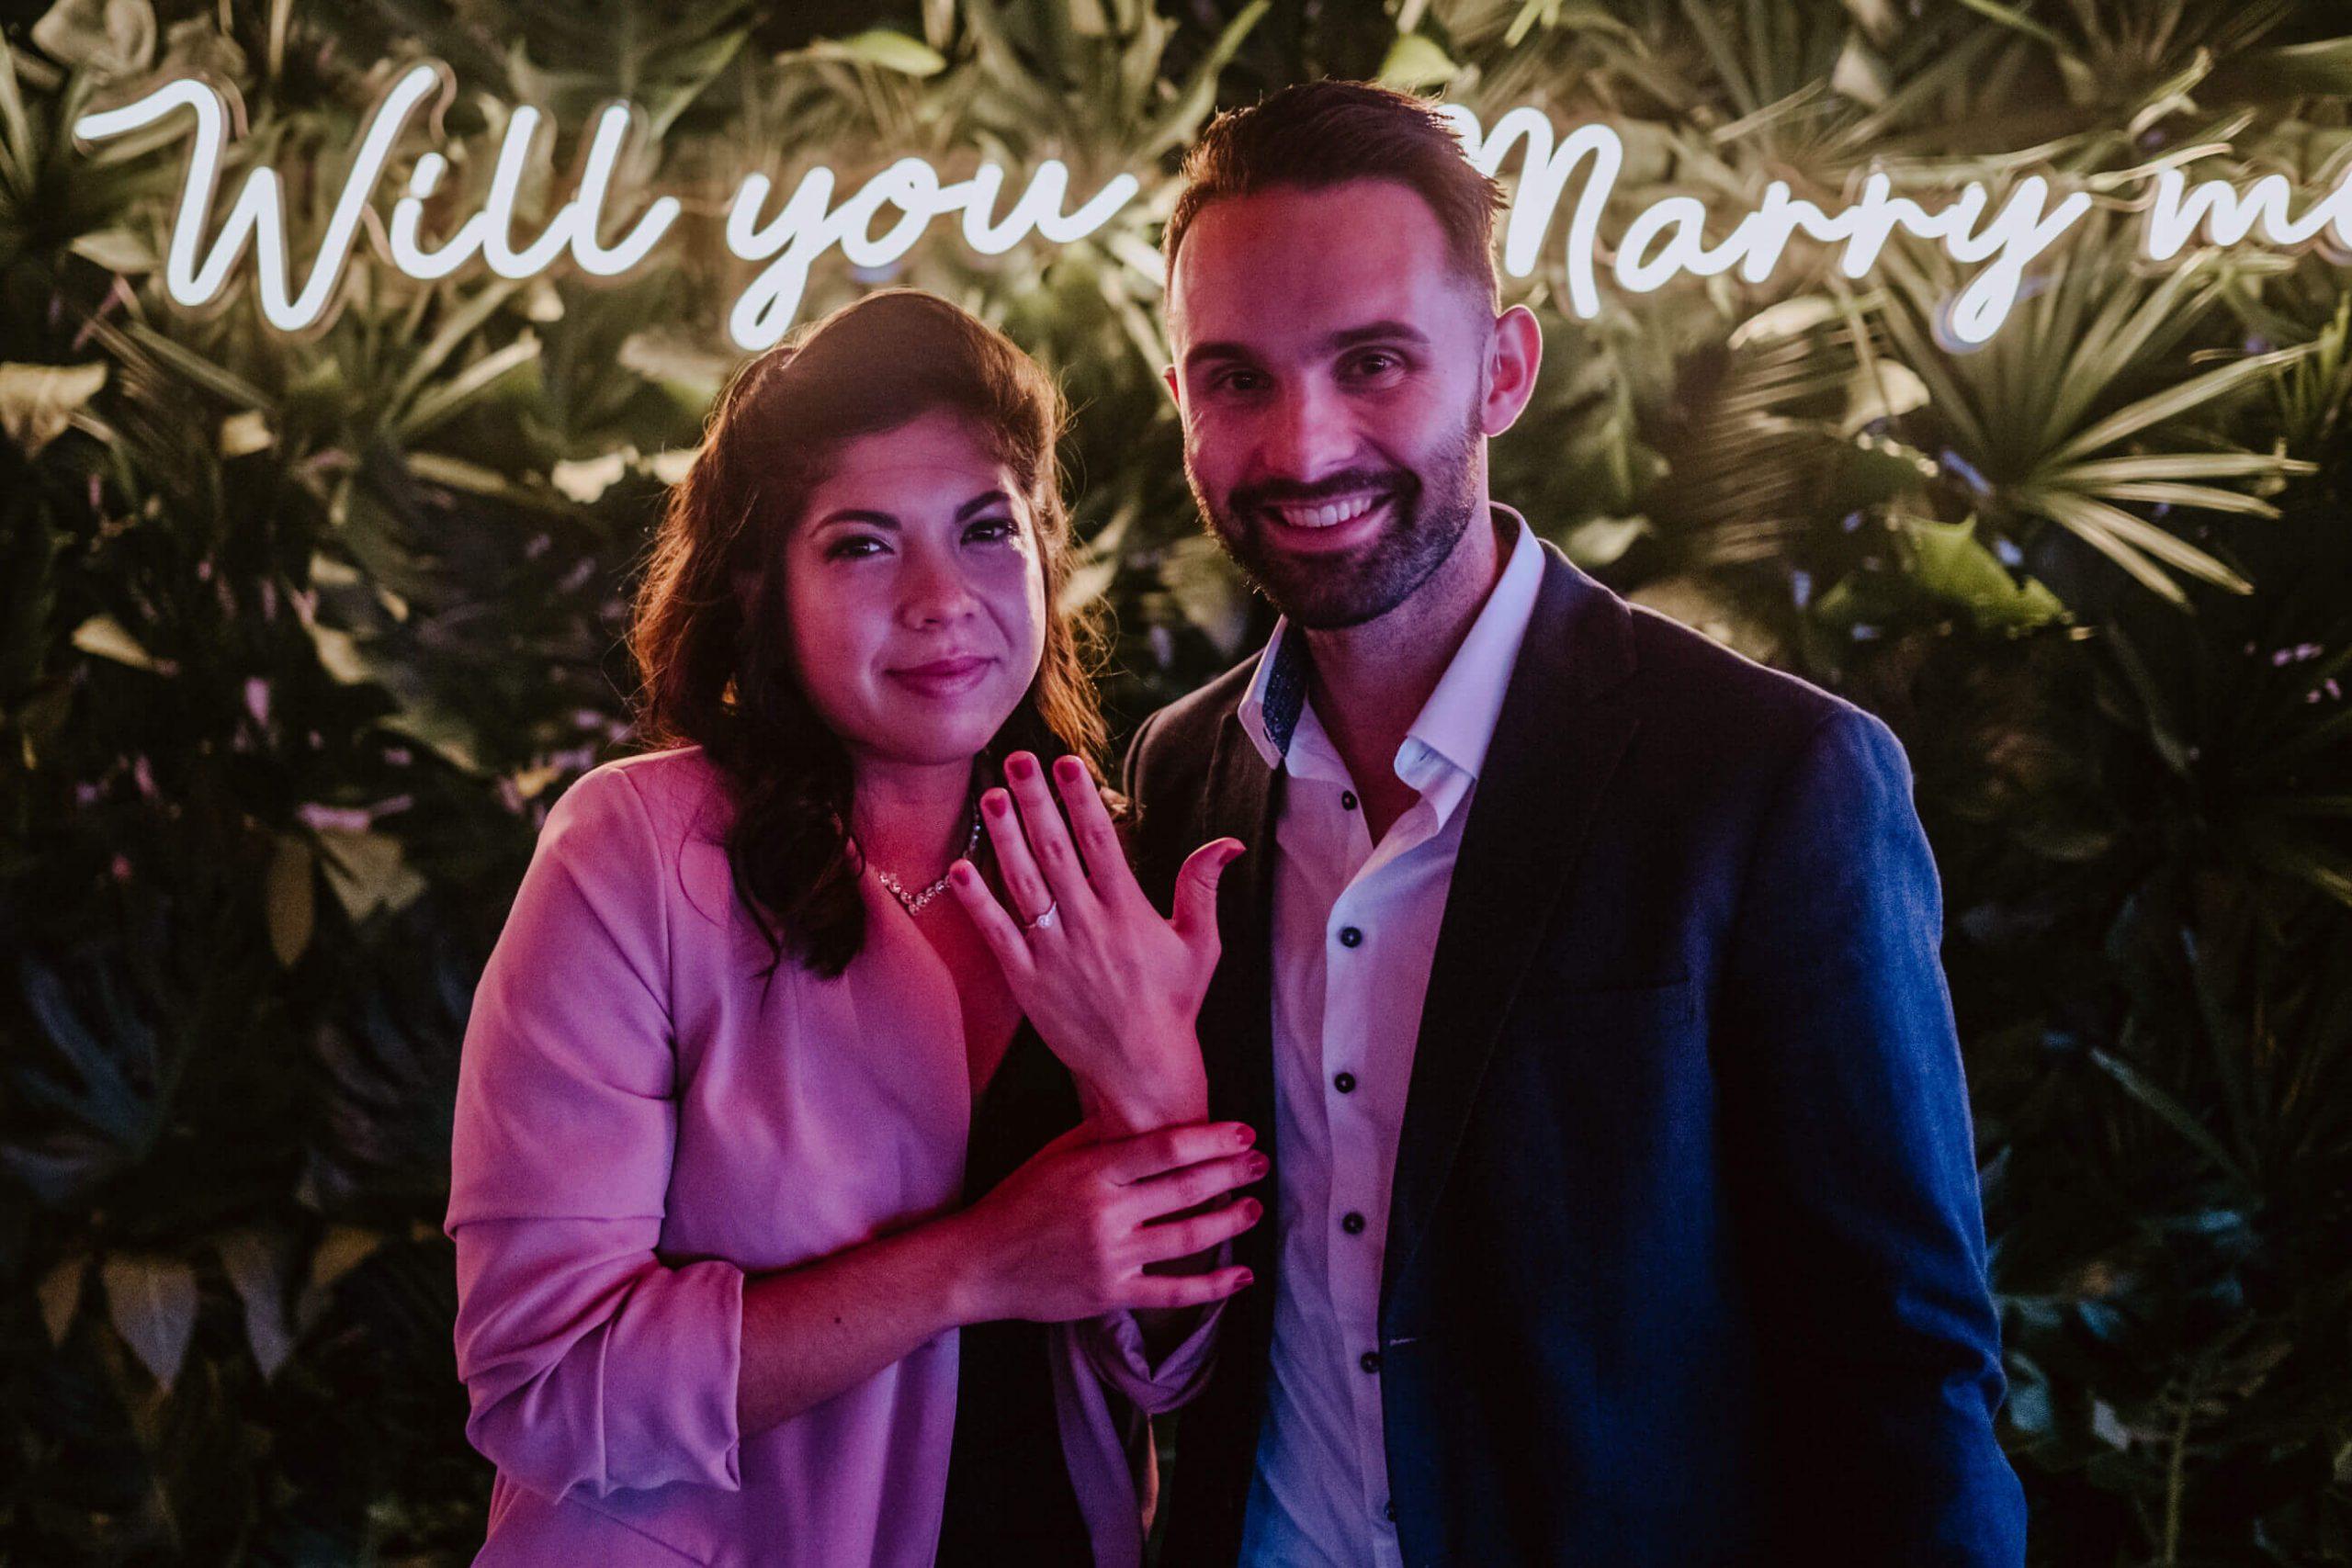 roma-organizacao-eventos-pedido-casamento-casa-de-cha-da-boa-nova-porto-portugal-17